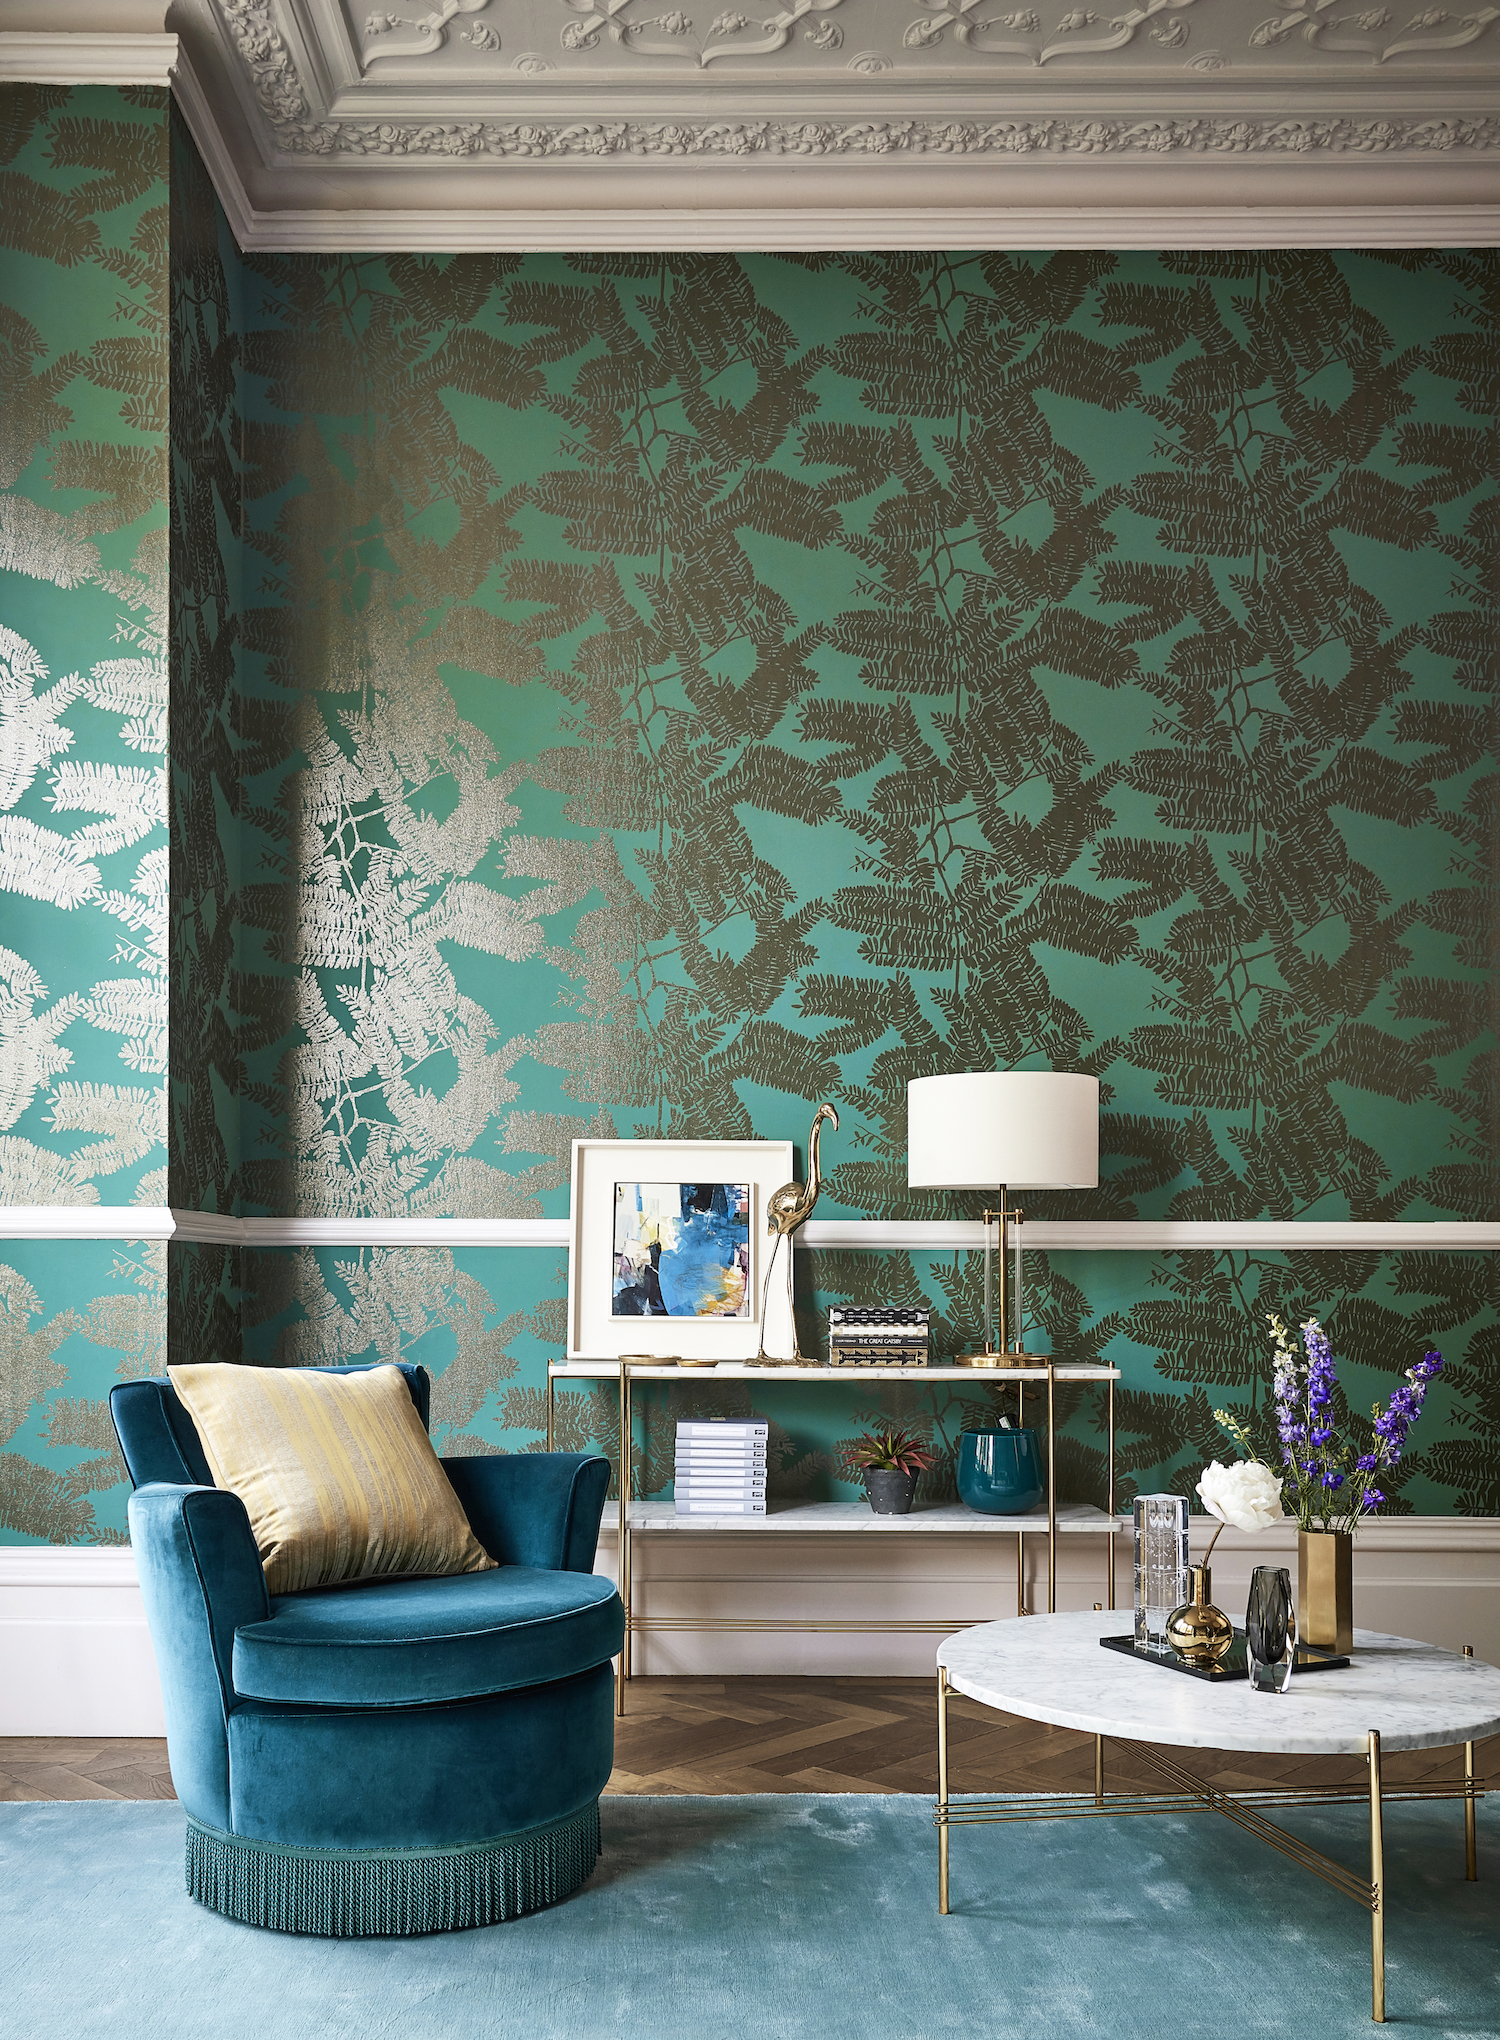 Curtain: Glance - £58 per m, Chair: Folia Velvets - £60 per m, piping Folia Velvets - £60 per m, Cushion: Charm - £50 per m.